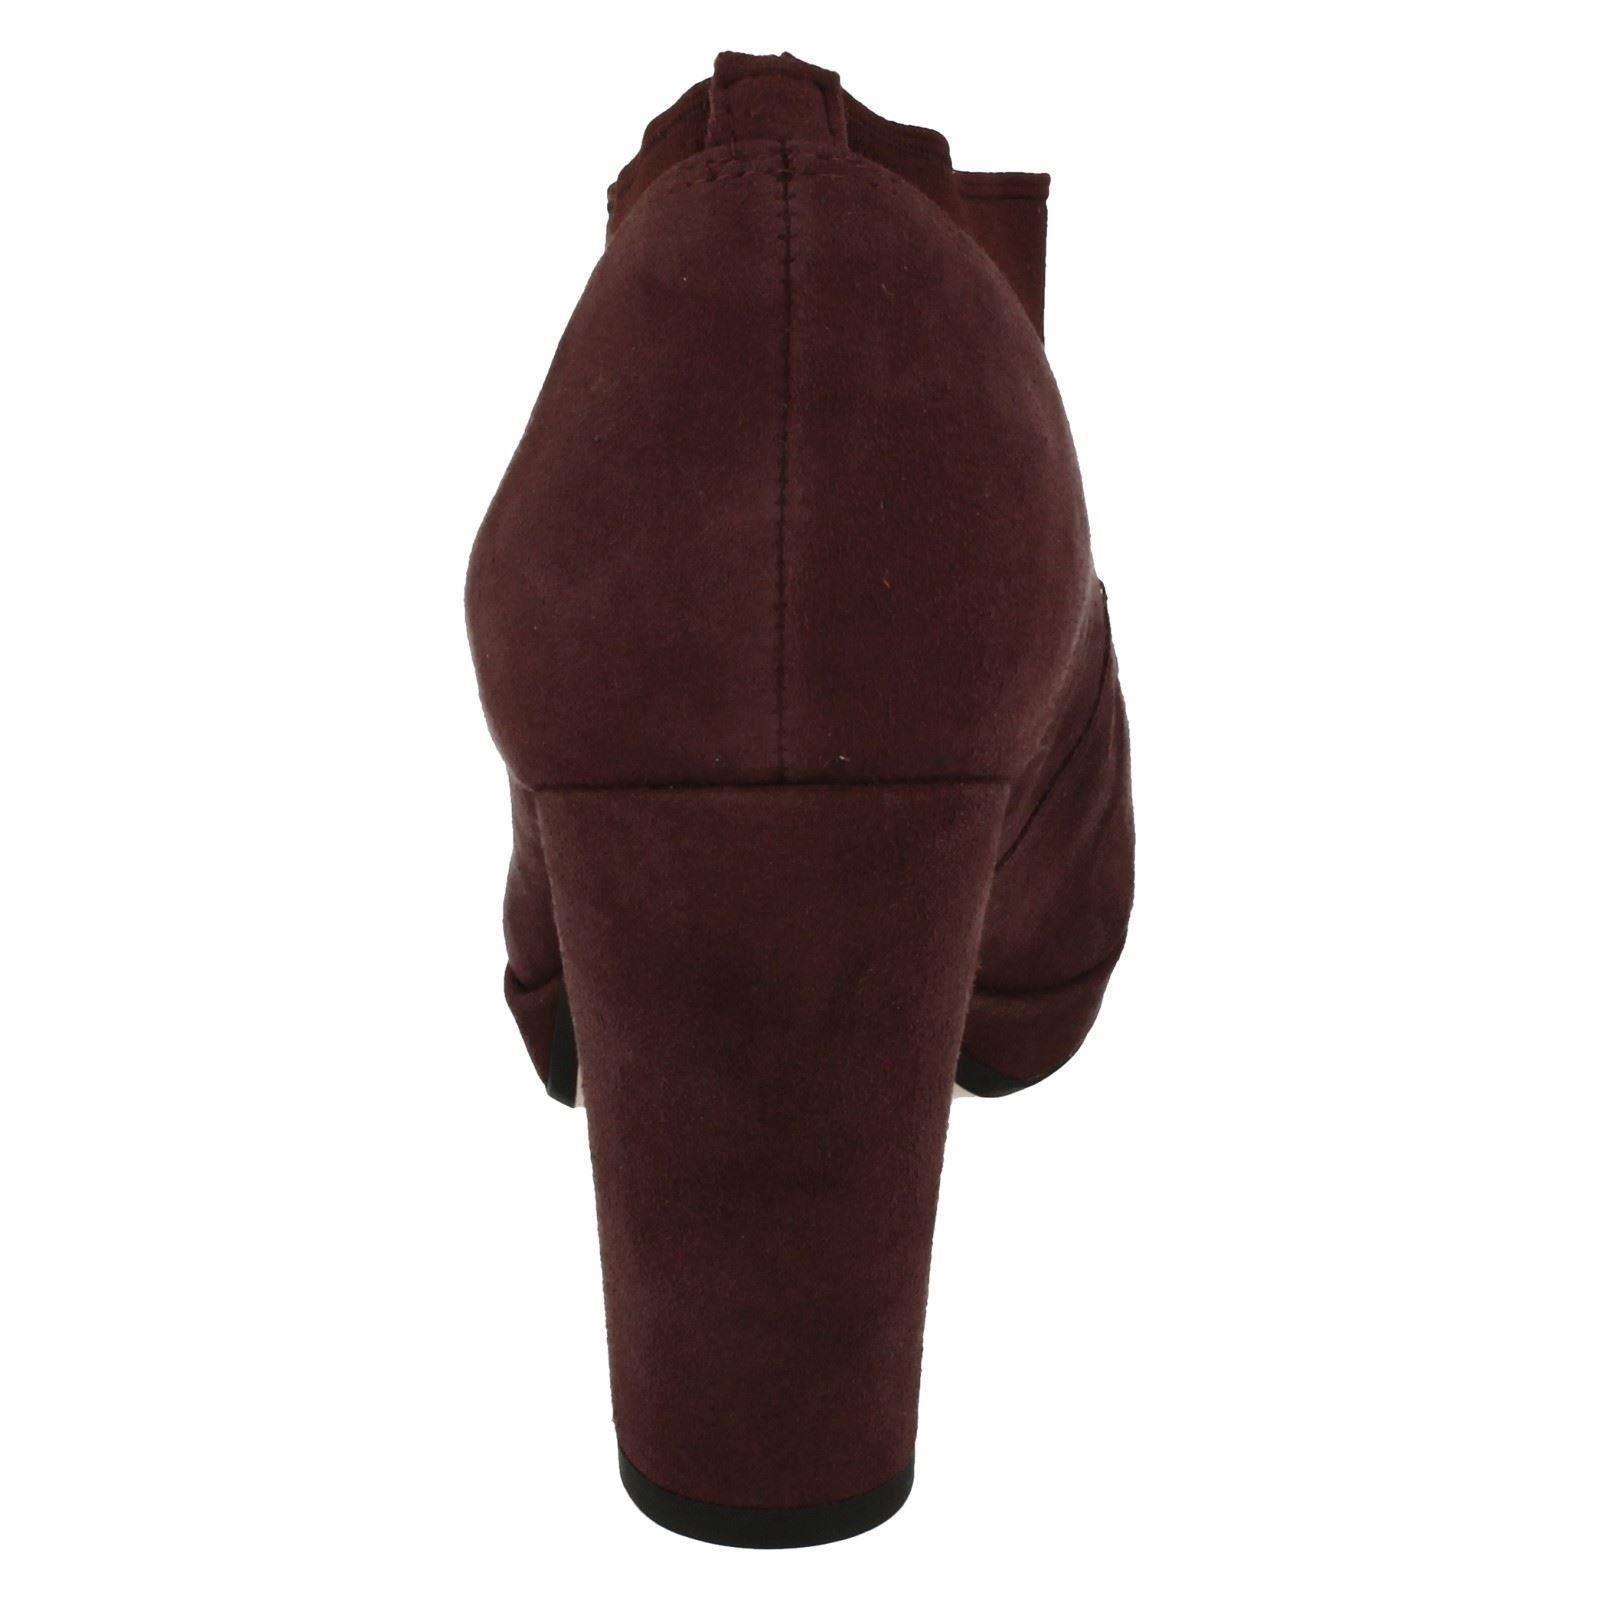 Donna Scarpe Clarcks Clarcks Clarcks Smart Pantaloni Kendra Mix | Alla Moda  2a7e5c